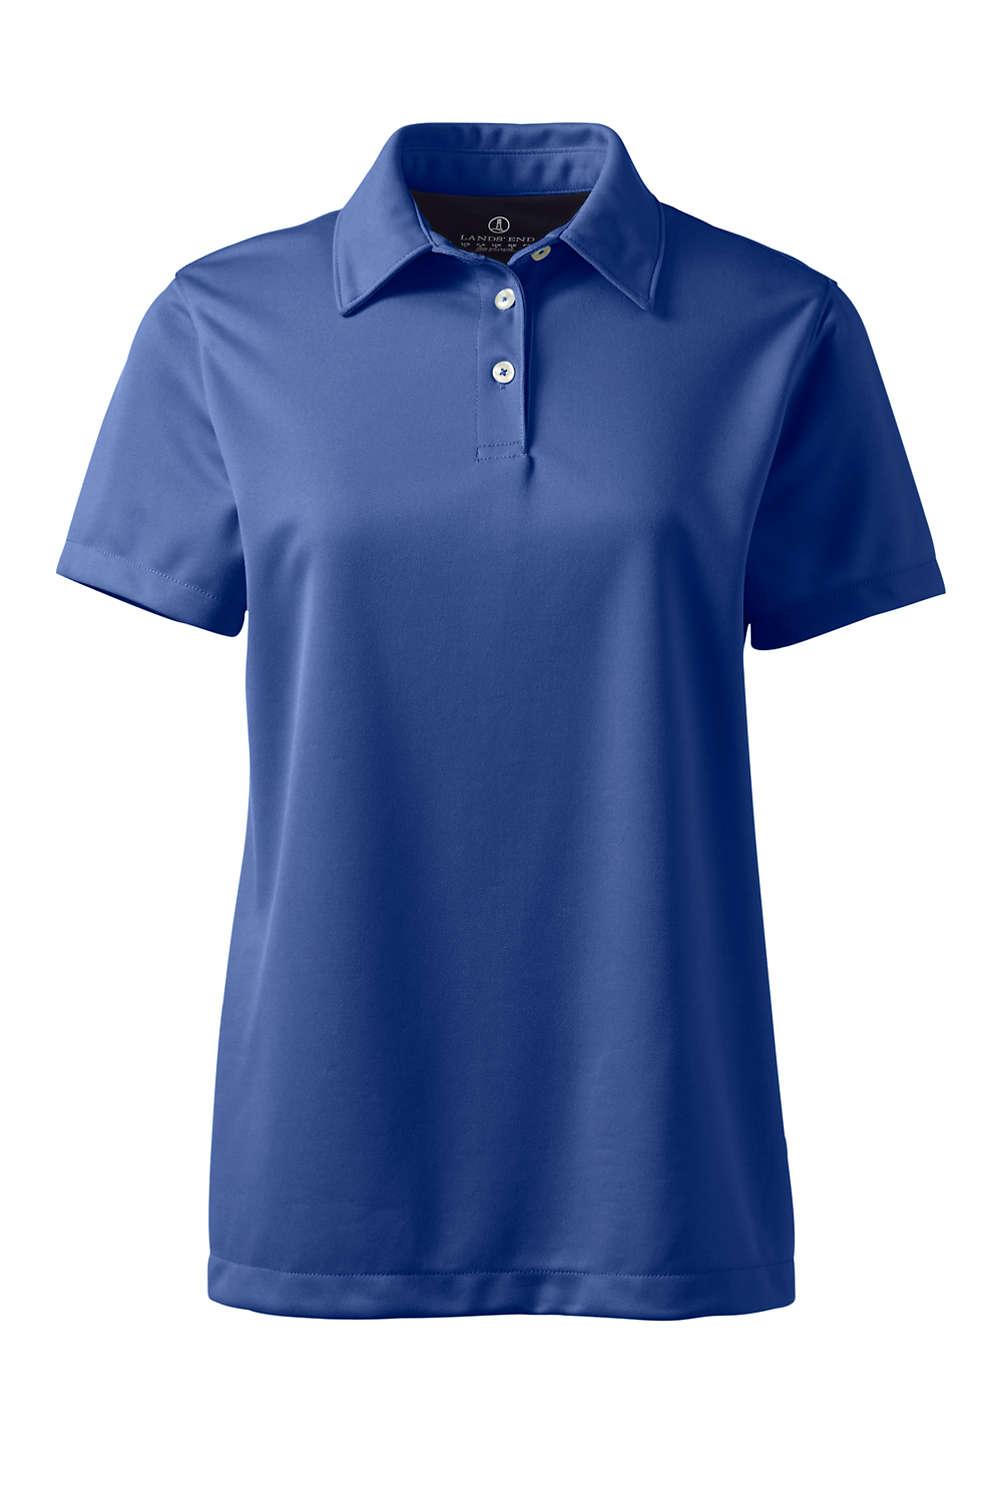 60928d73 Women's Short Sleeve Active Piqué Polo from Lands' End